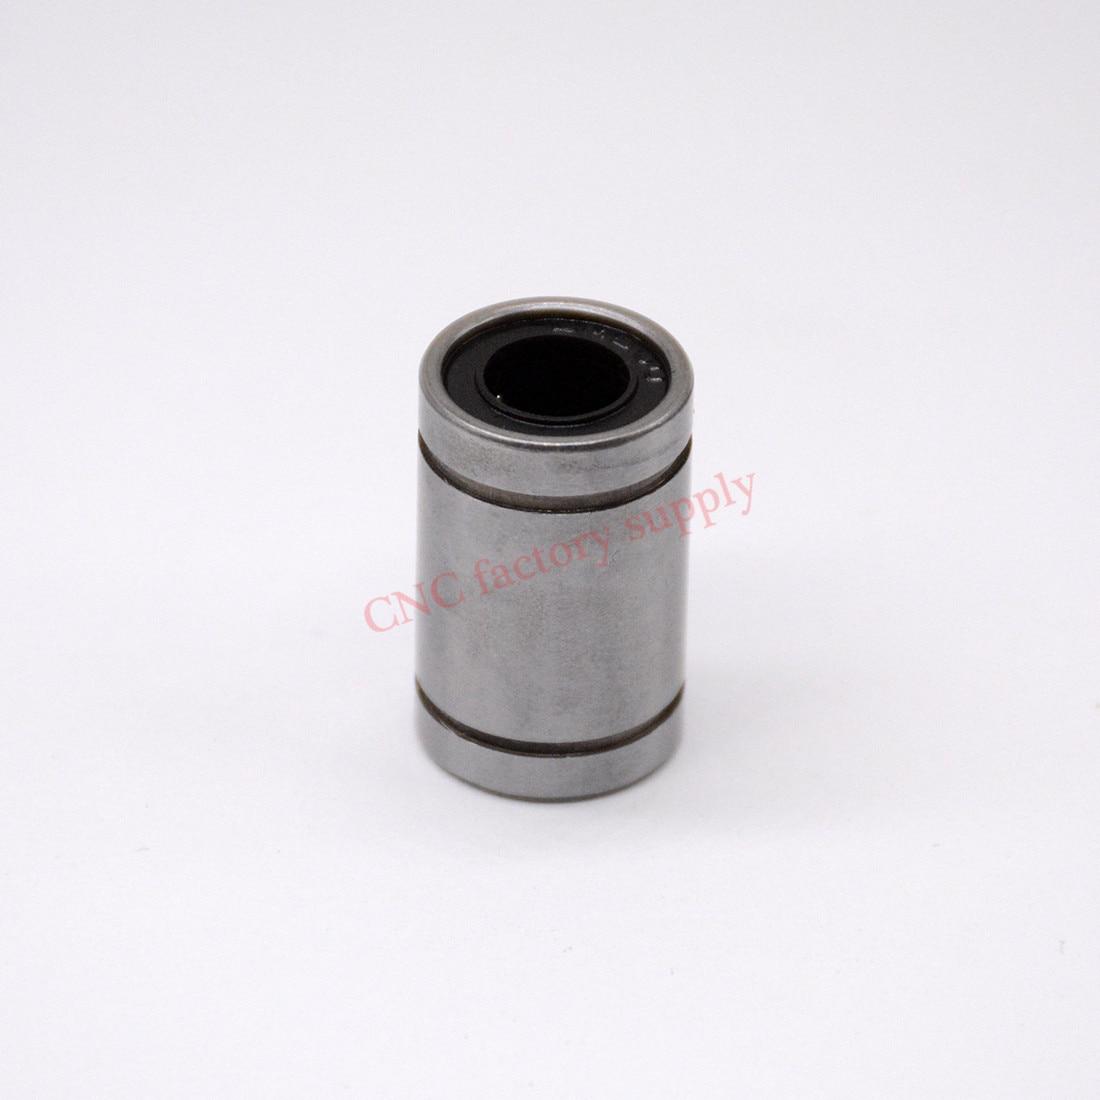 Hot sale  1pc LM10UU Linear Bushing  10mm CNC Linear Bearings hot sale 1pc lm12uu linear bushing 12mm cnc linear bearings